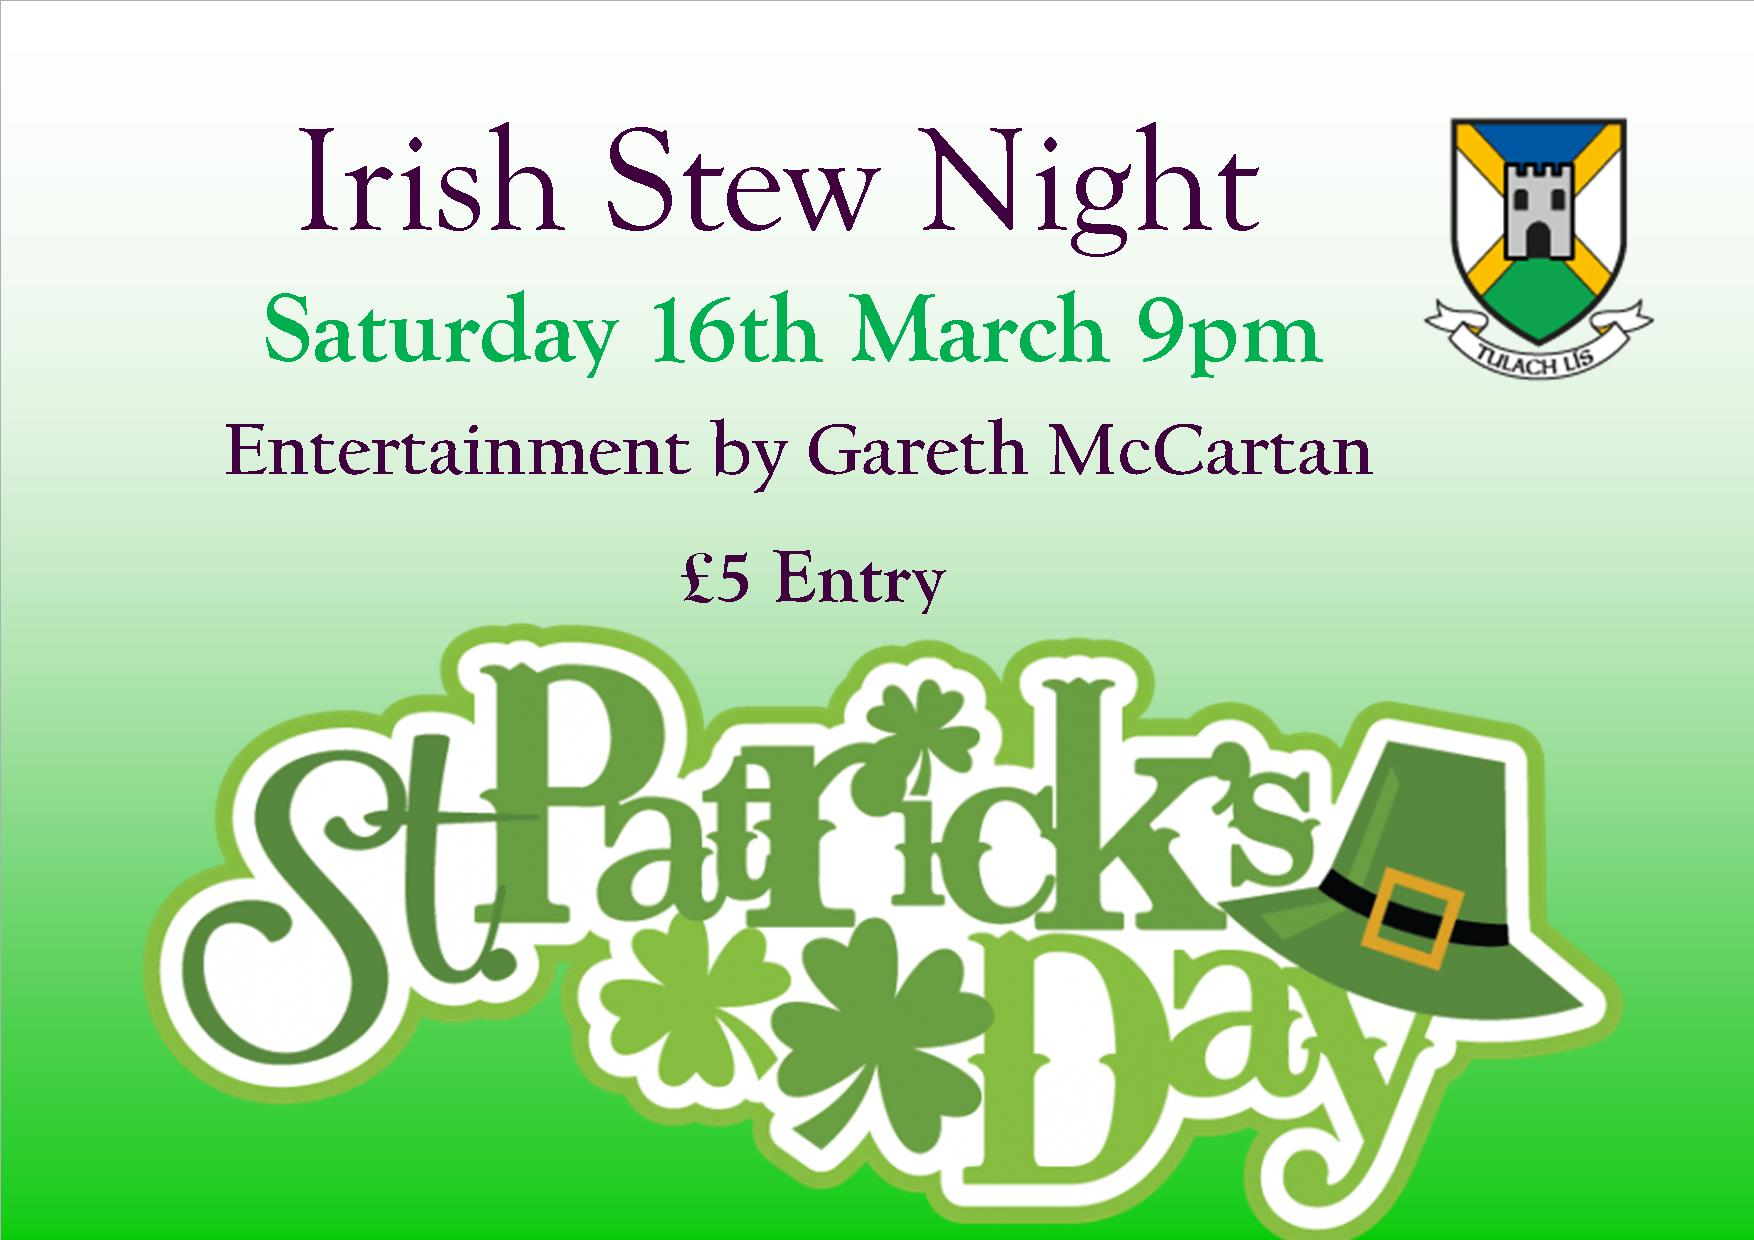 St. Patrick Celebration Night & Stew Night